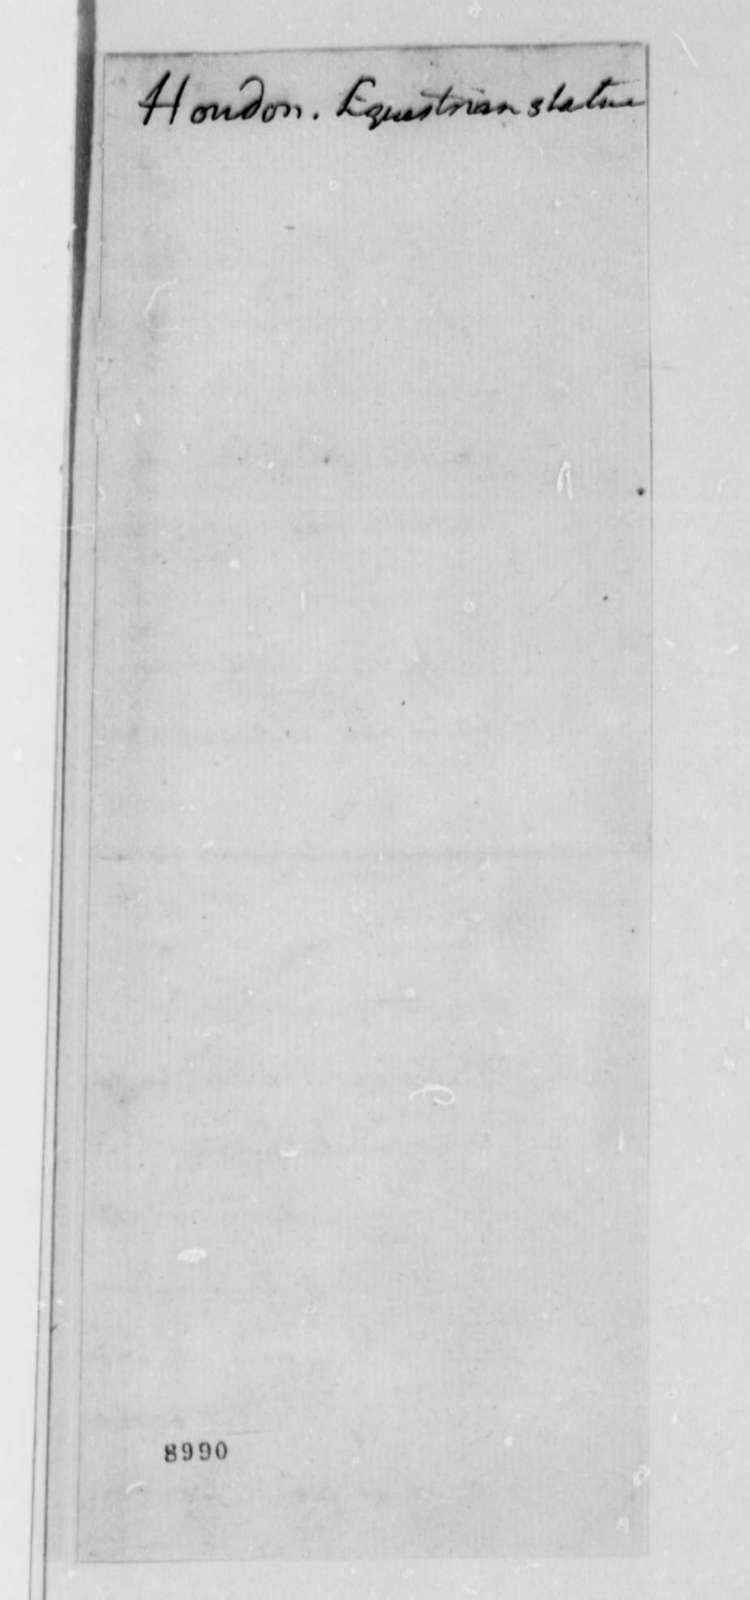 Jean Antoine Houdon, 1789, Revised Estimate for Bronze Statue of George Washington